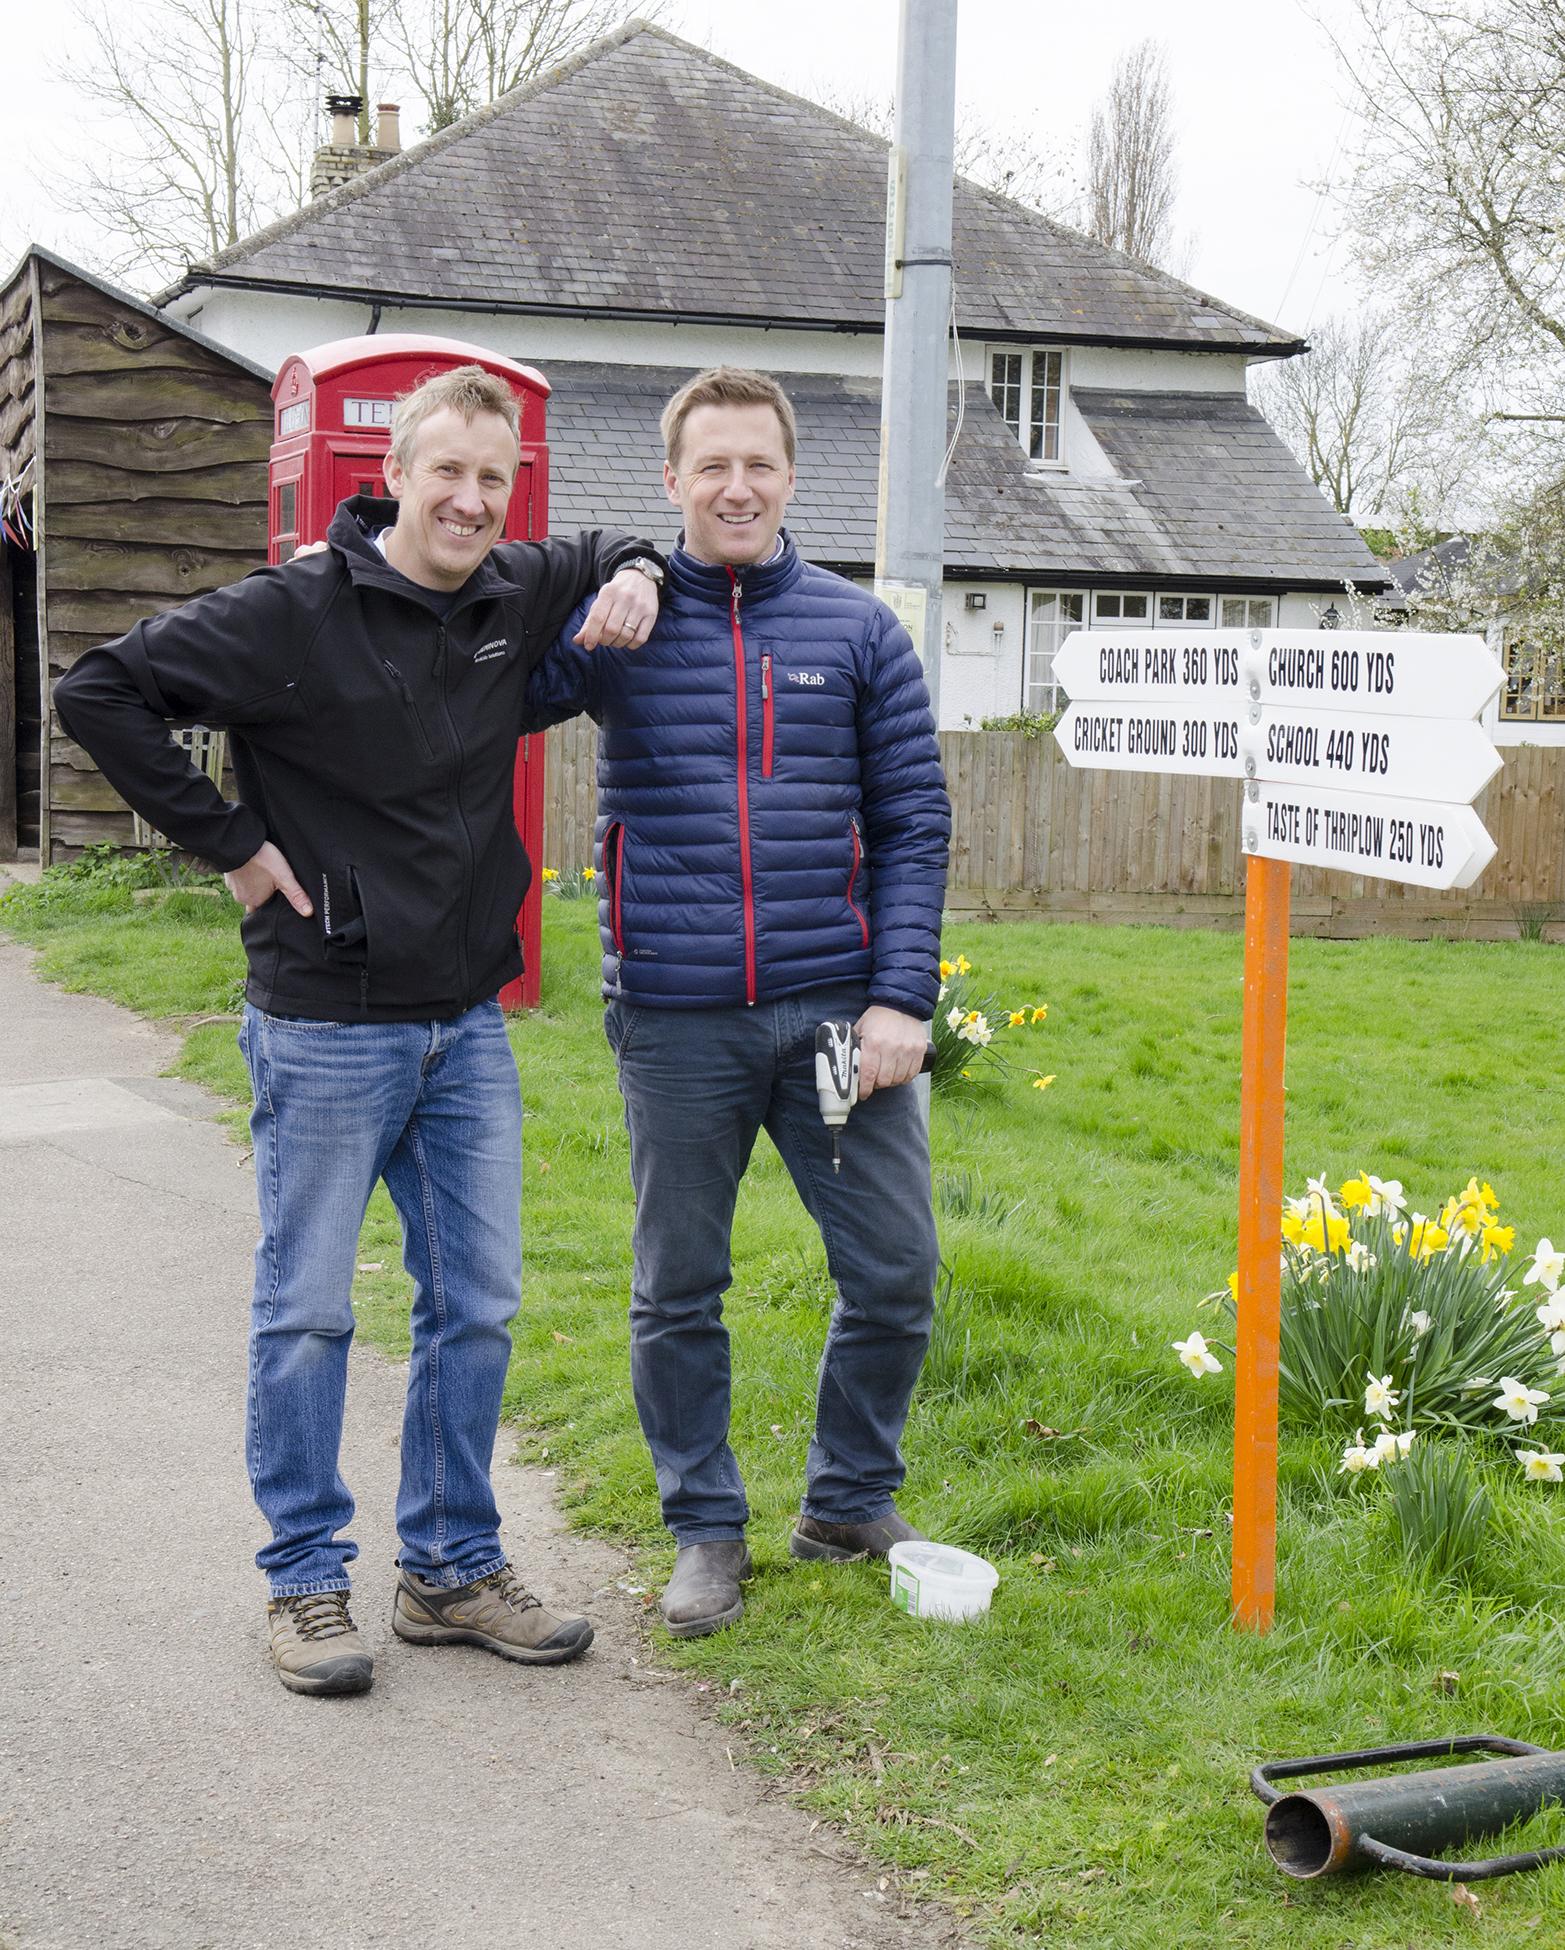 Jonny and Mark set up the signage